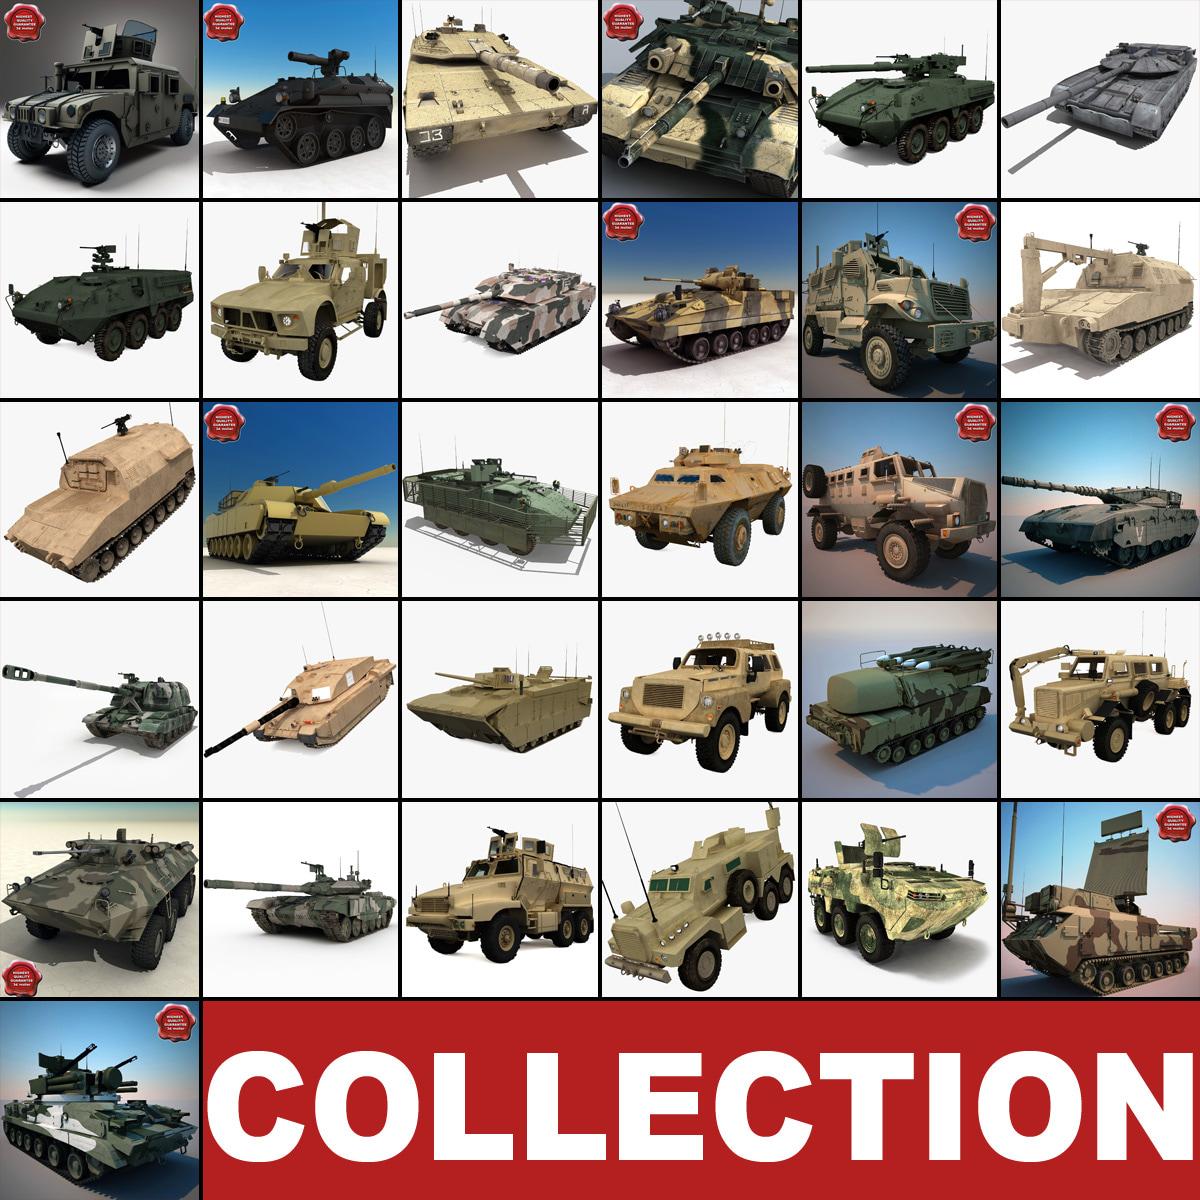 Tanks_Collection_V15_000.jpg